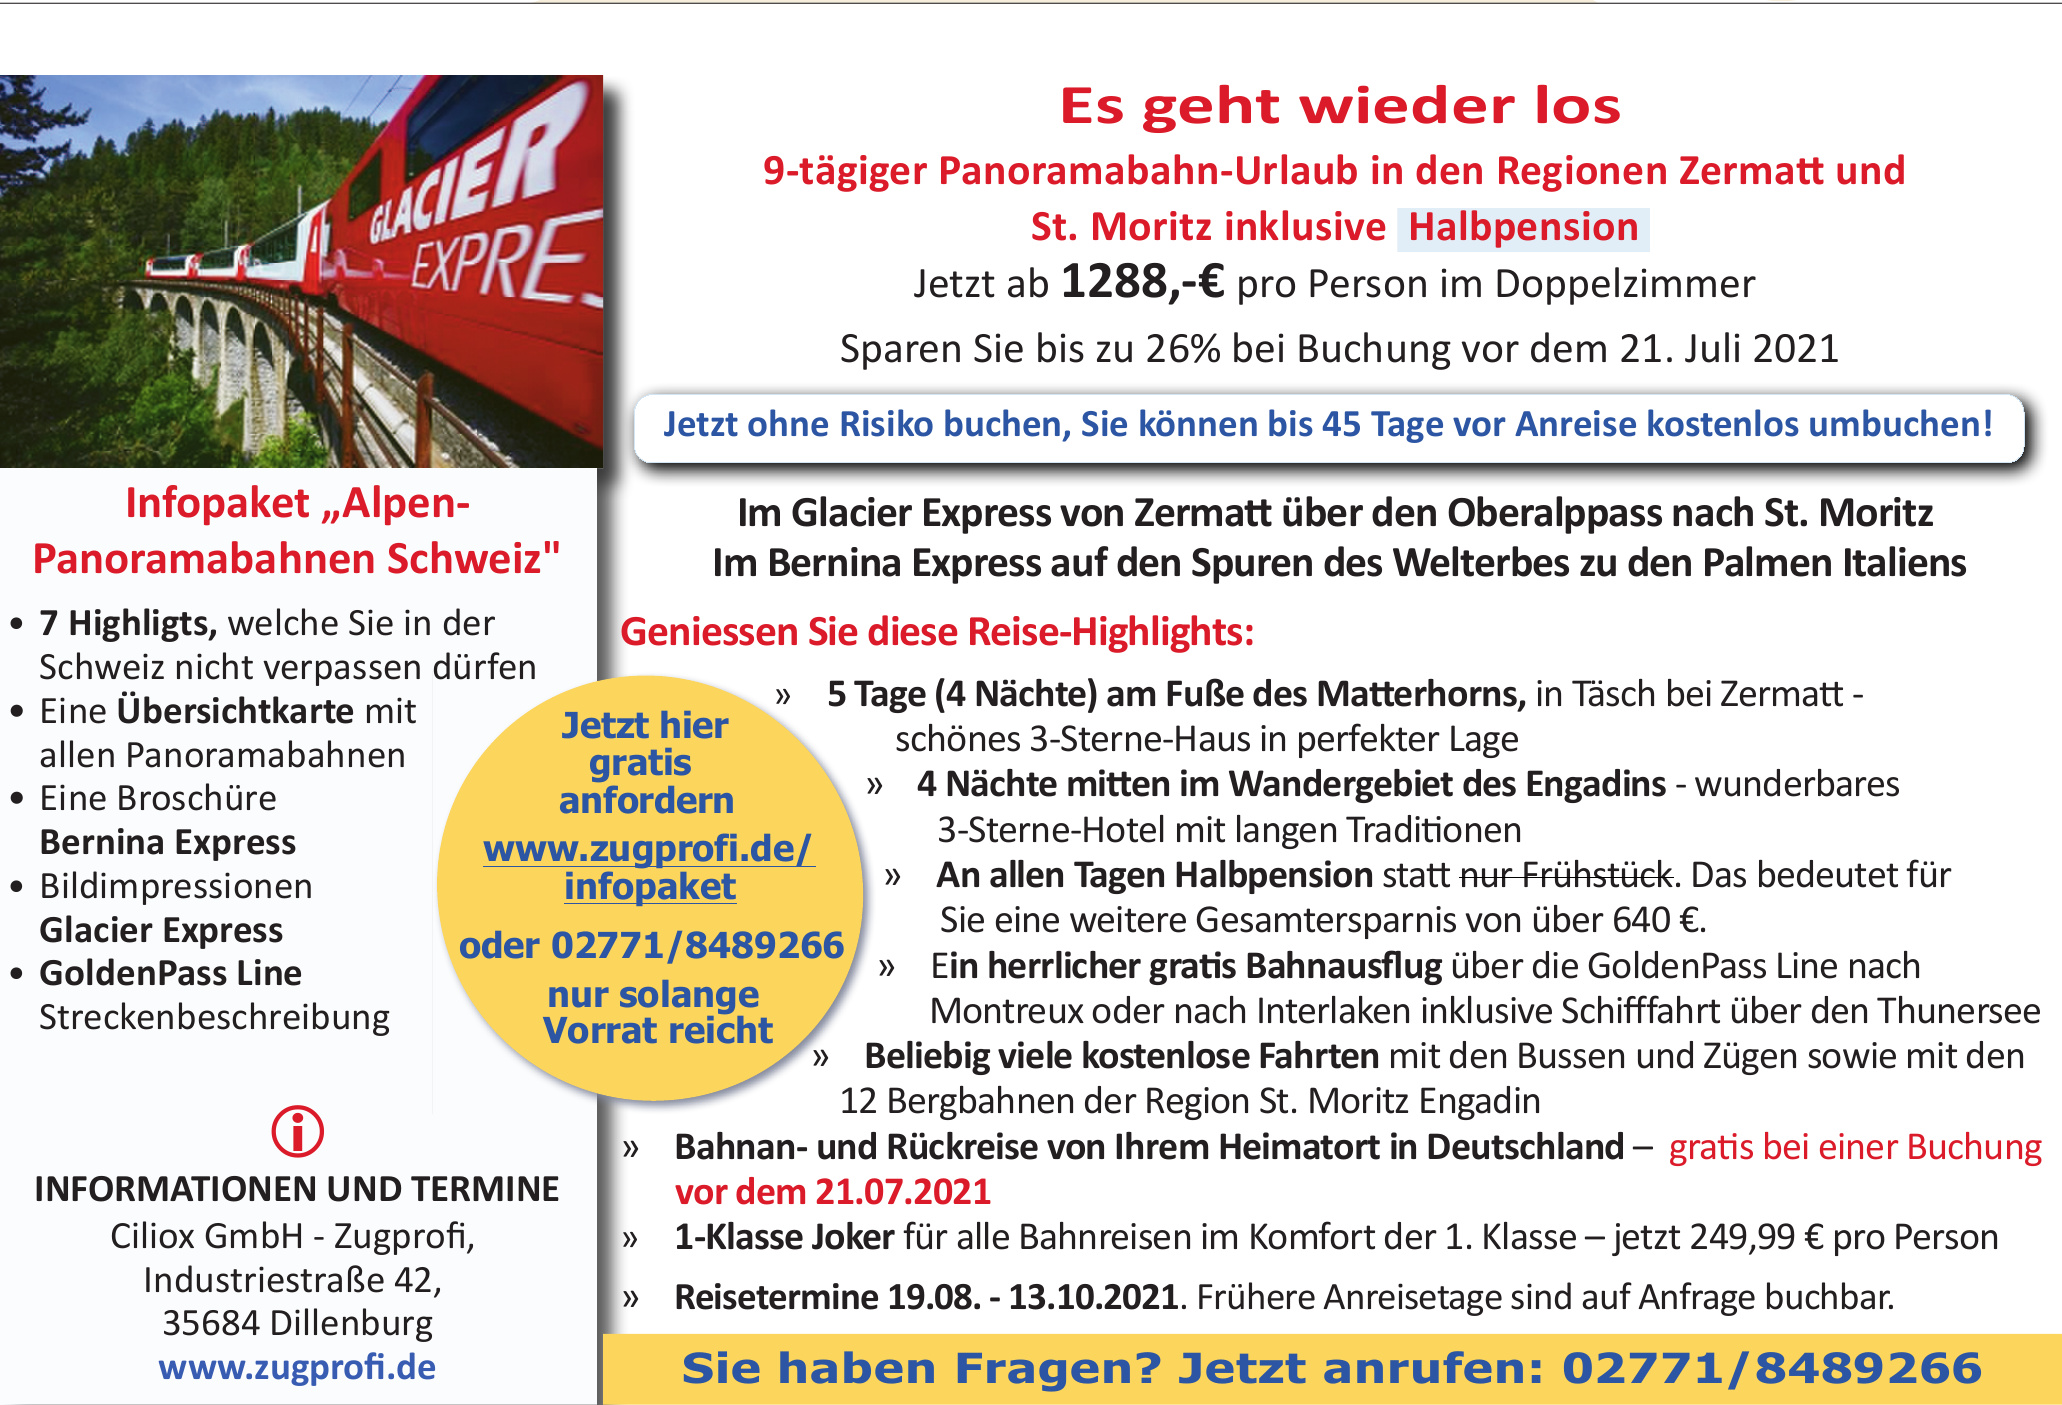 Ciliox GmbH - Zugprofi